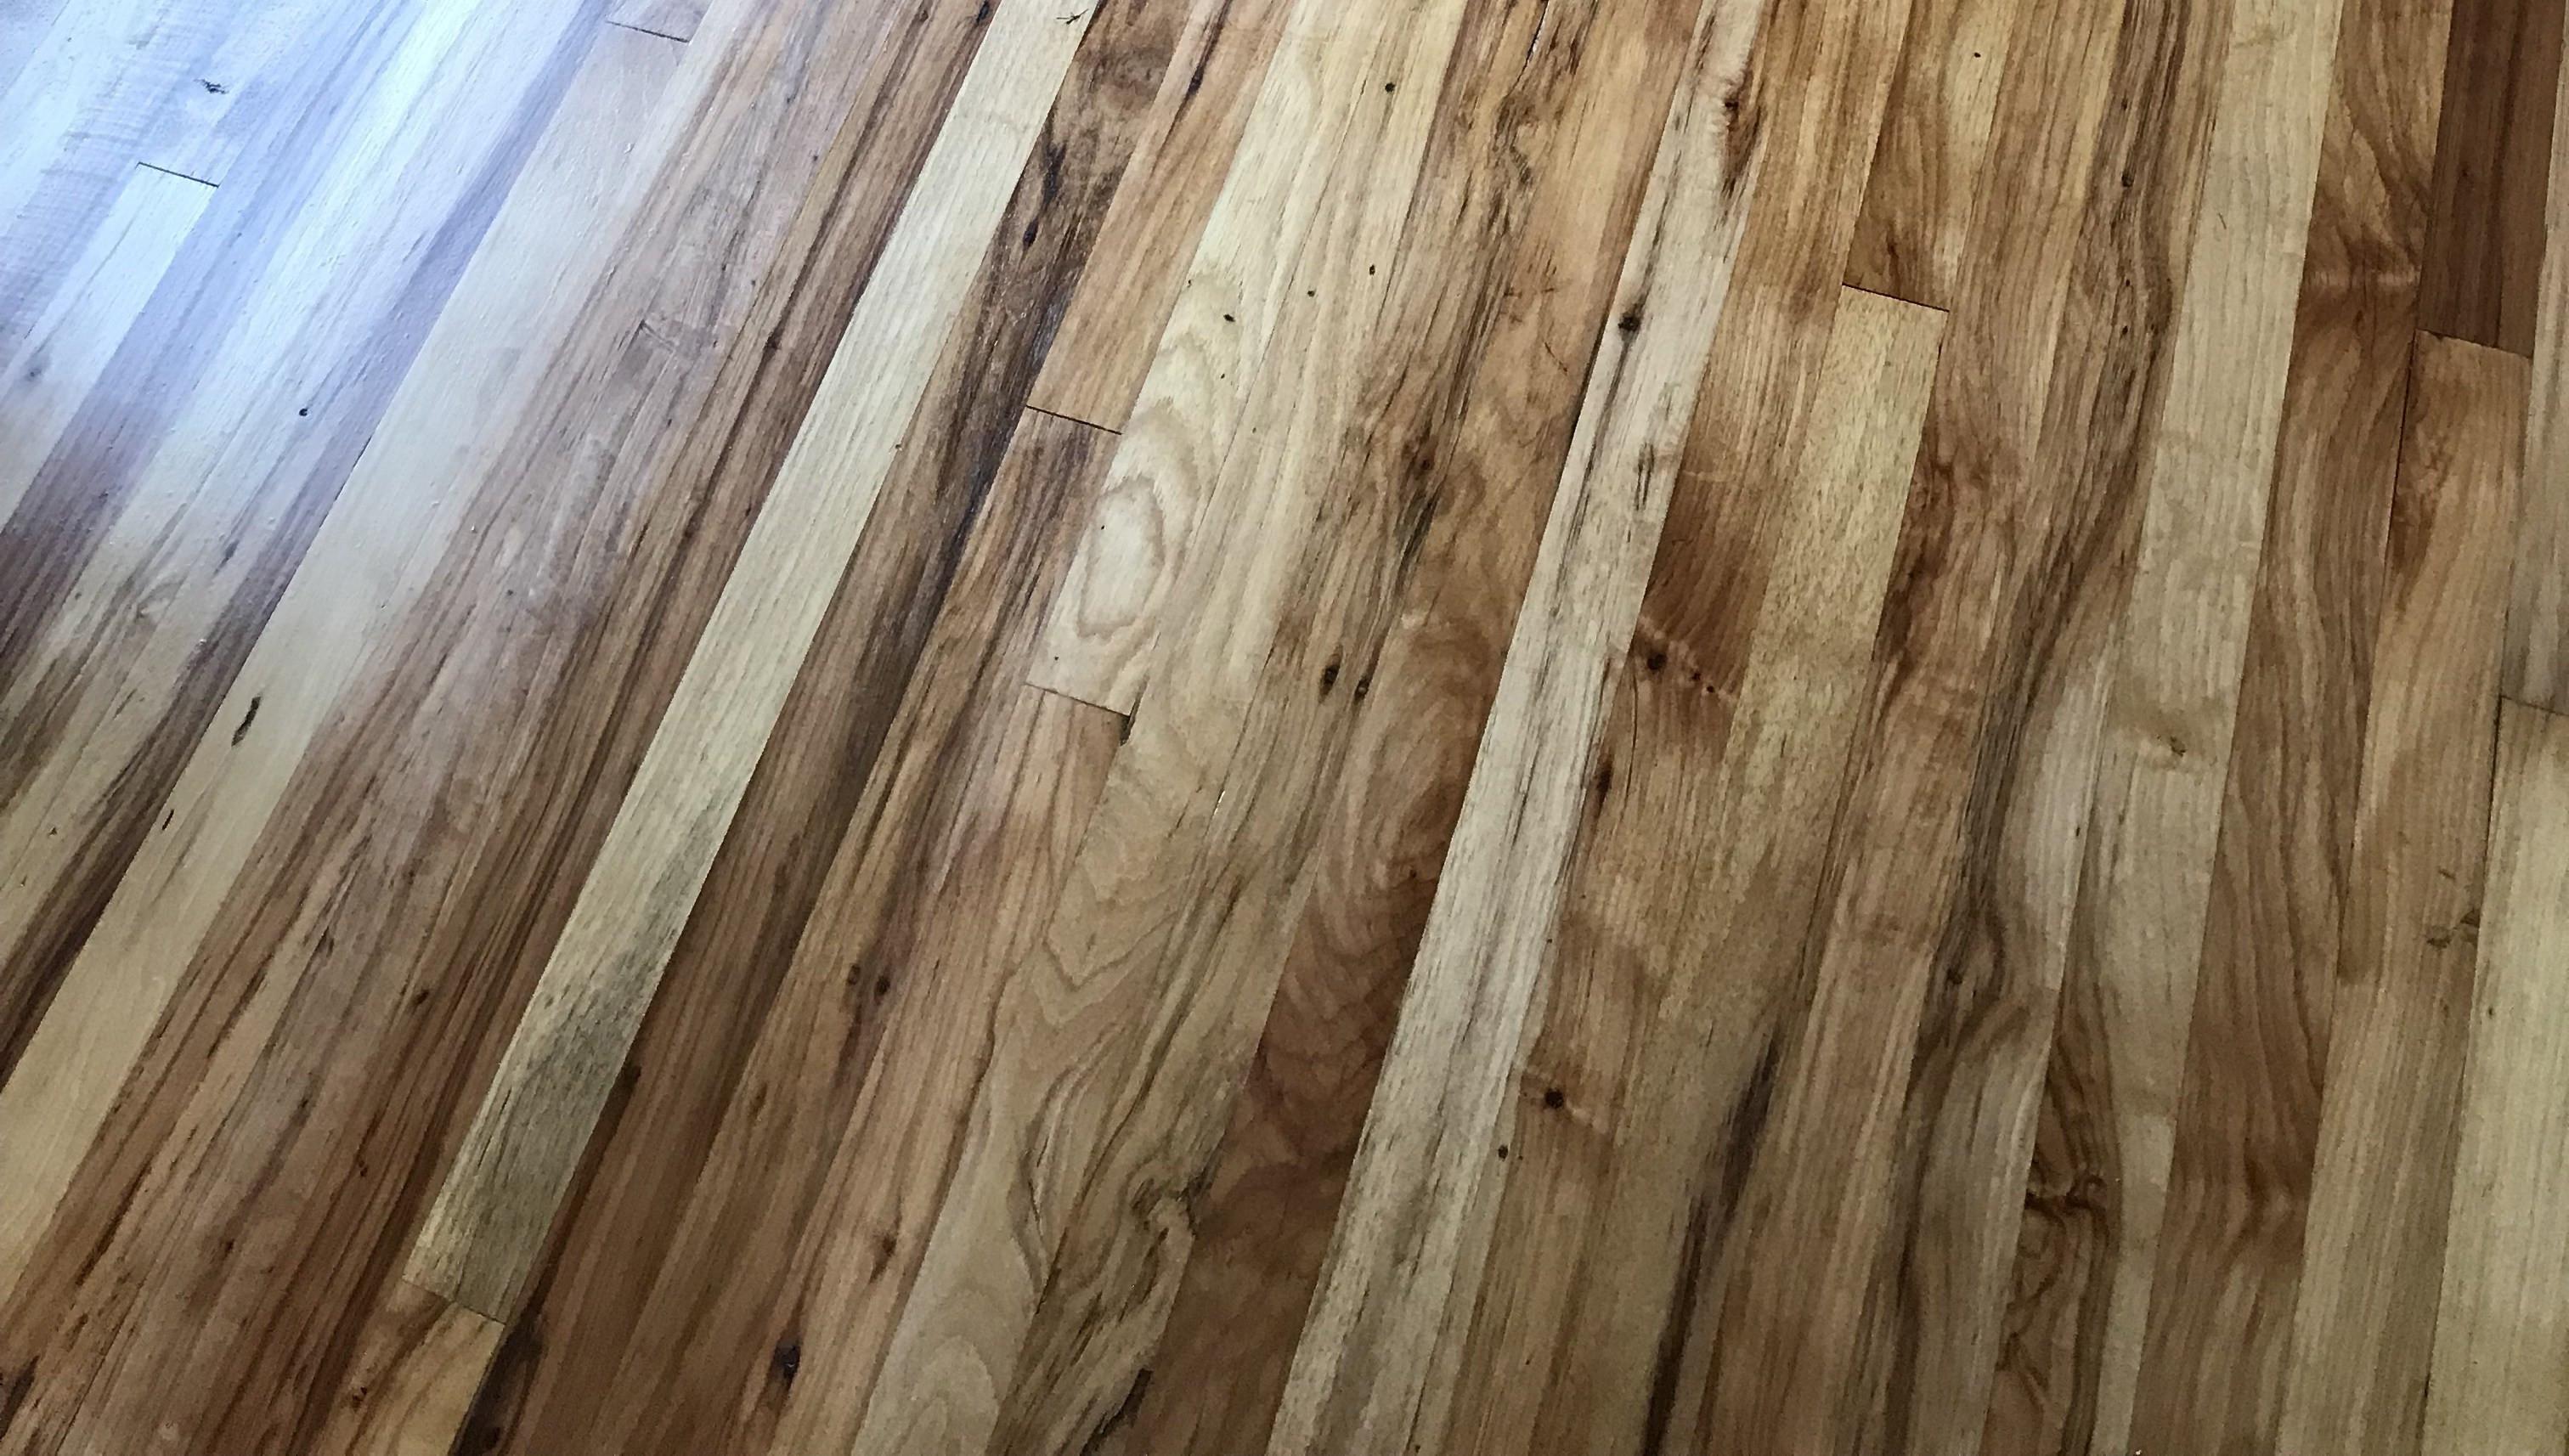 sanding hardwood floors cost of refinishing hardwood floors carlhaven made with refinishing hardwood floors